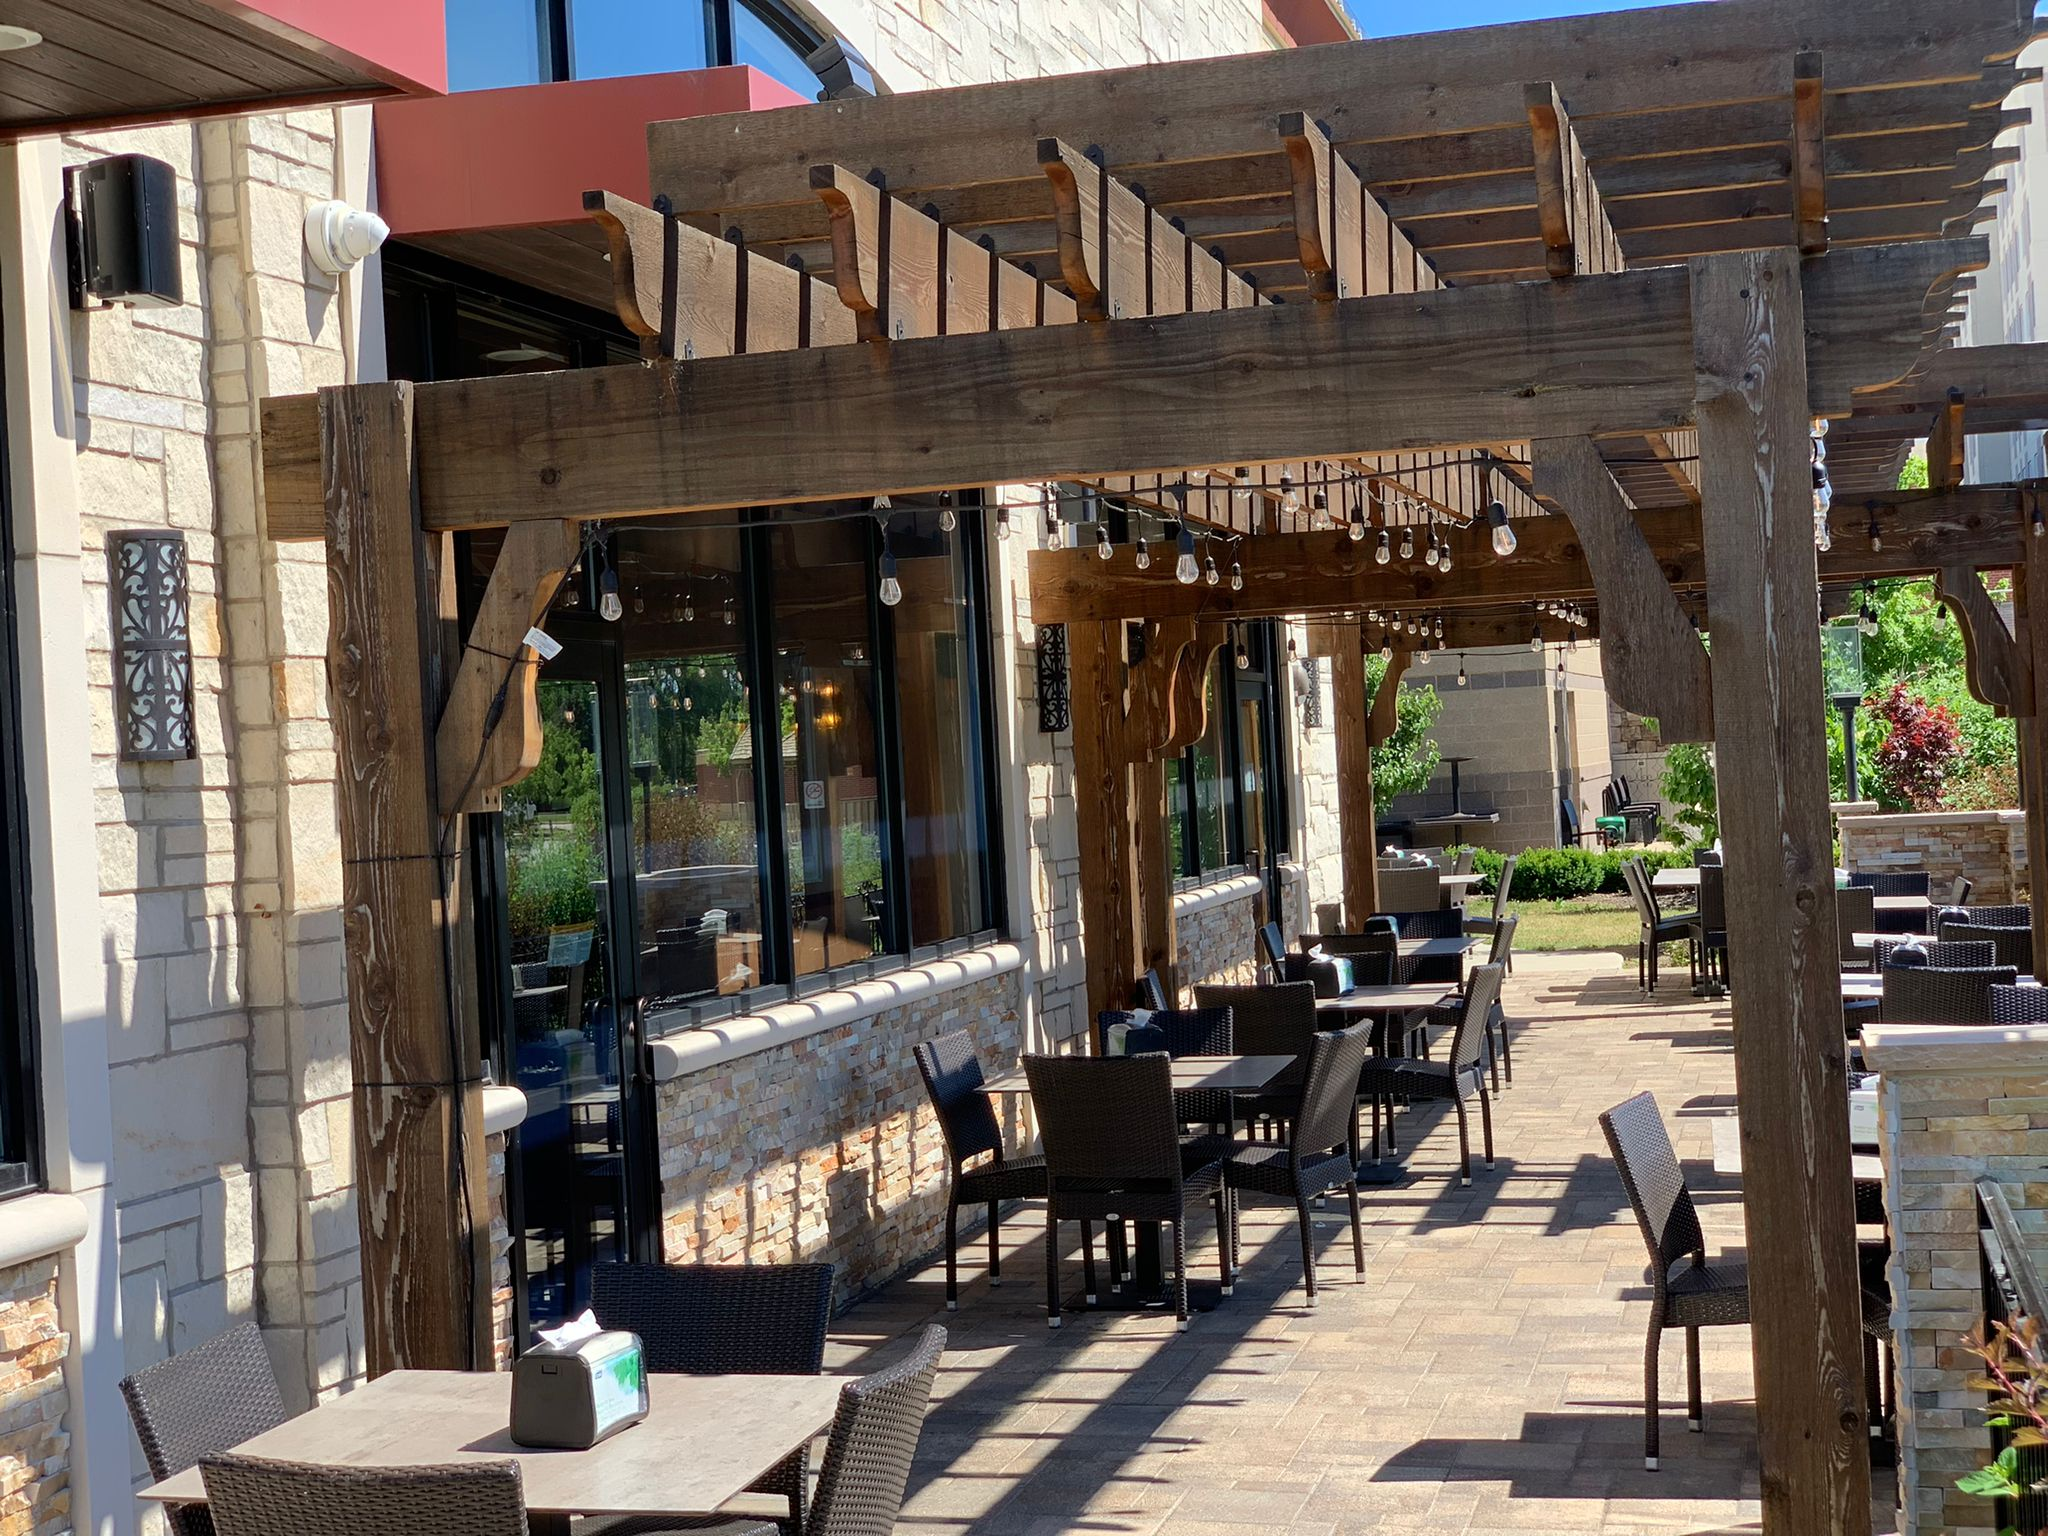 Patio of Pita Inn Naperville location